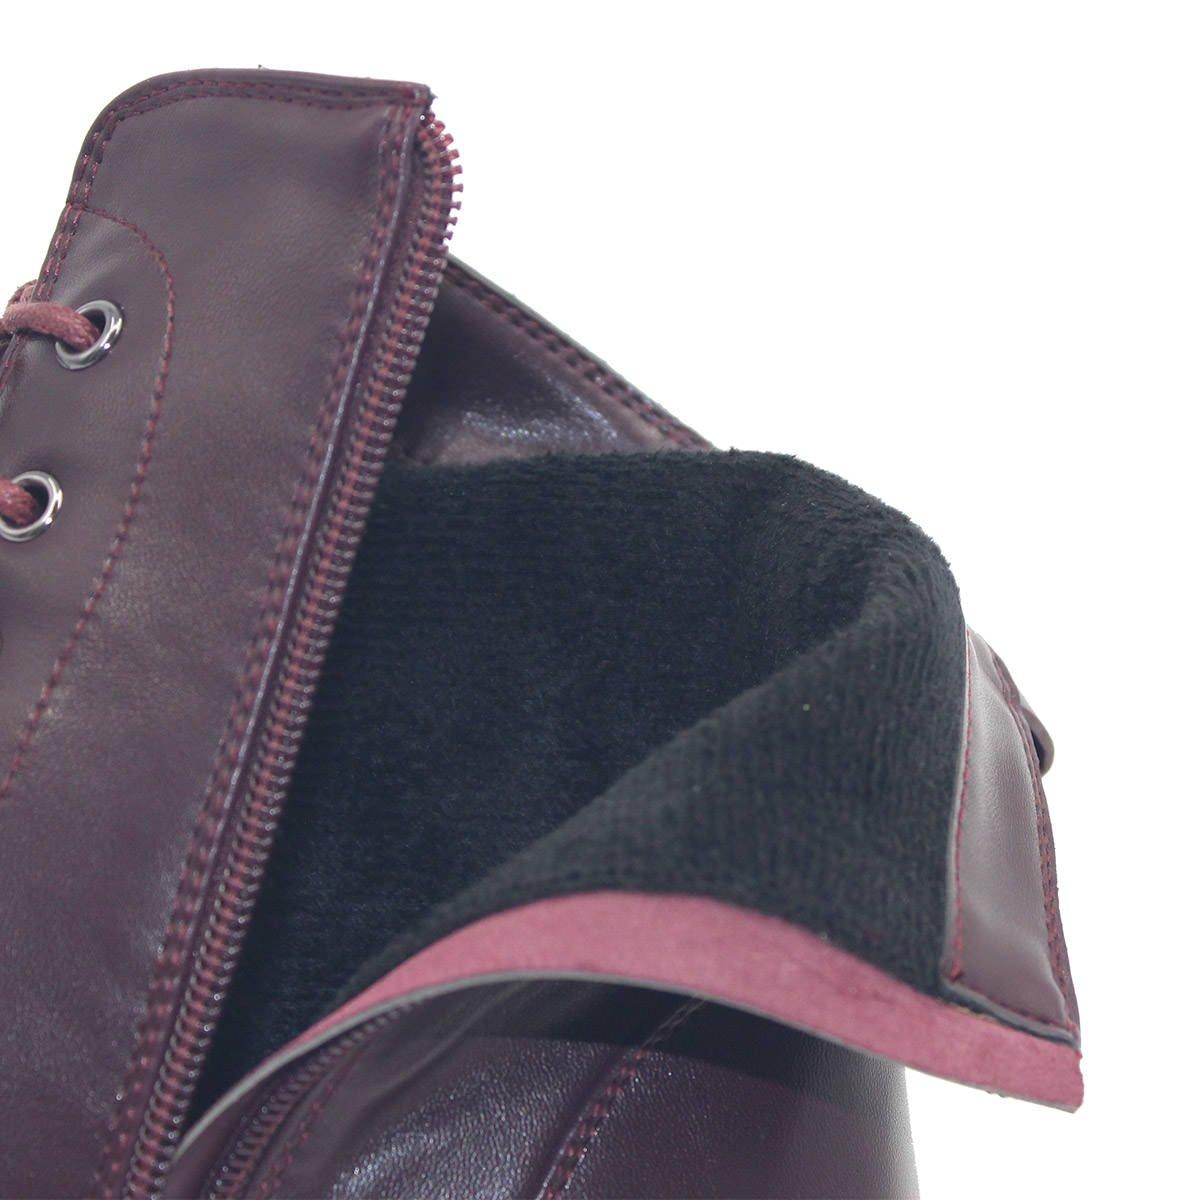 ZAPROMA Frauen Herbst Warmside Warmside Warmside Zipper Kampfstil Lace Up Onkel Stiefely e9fa6d